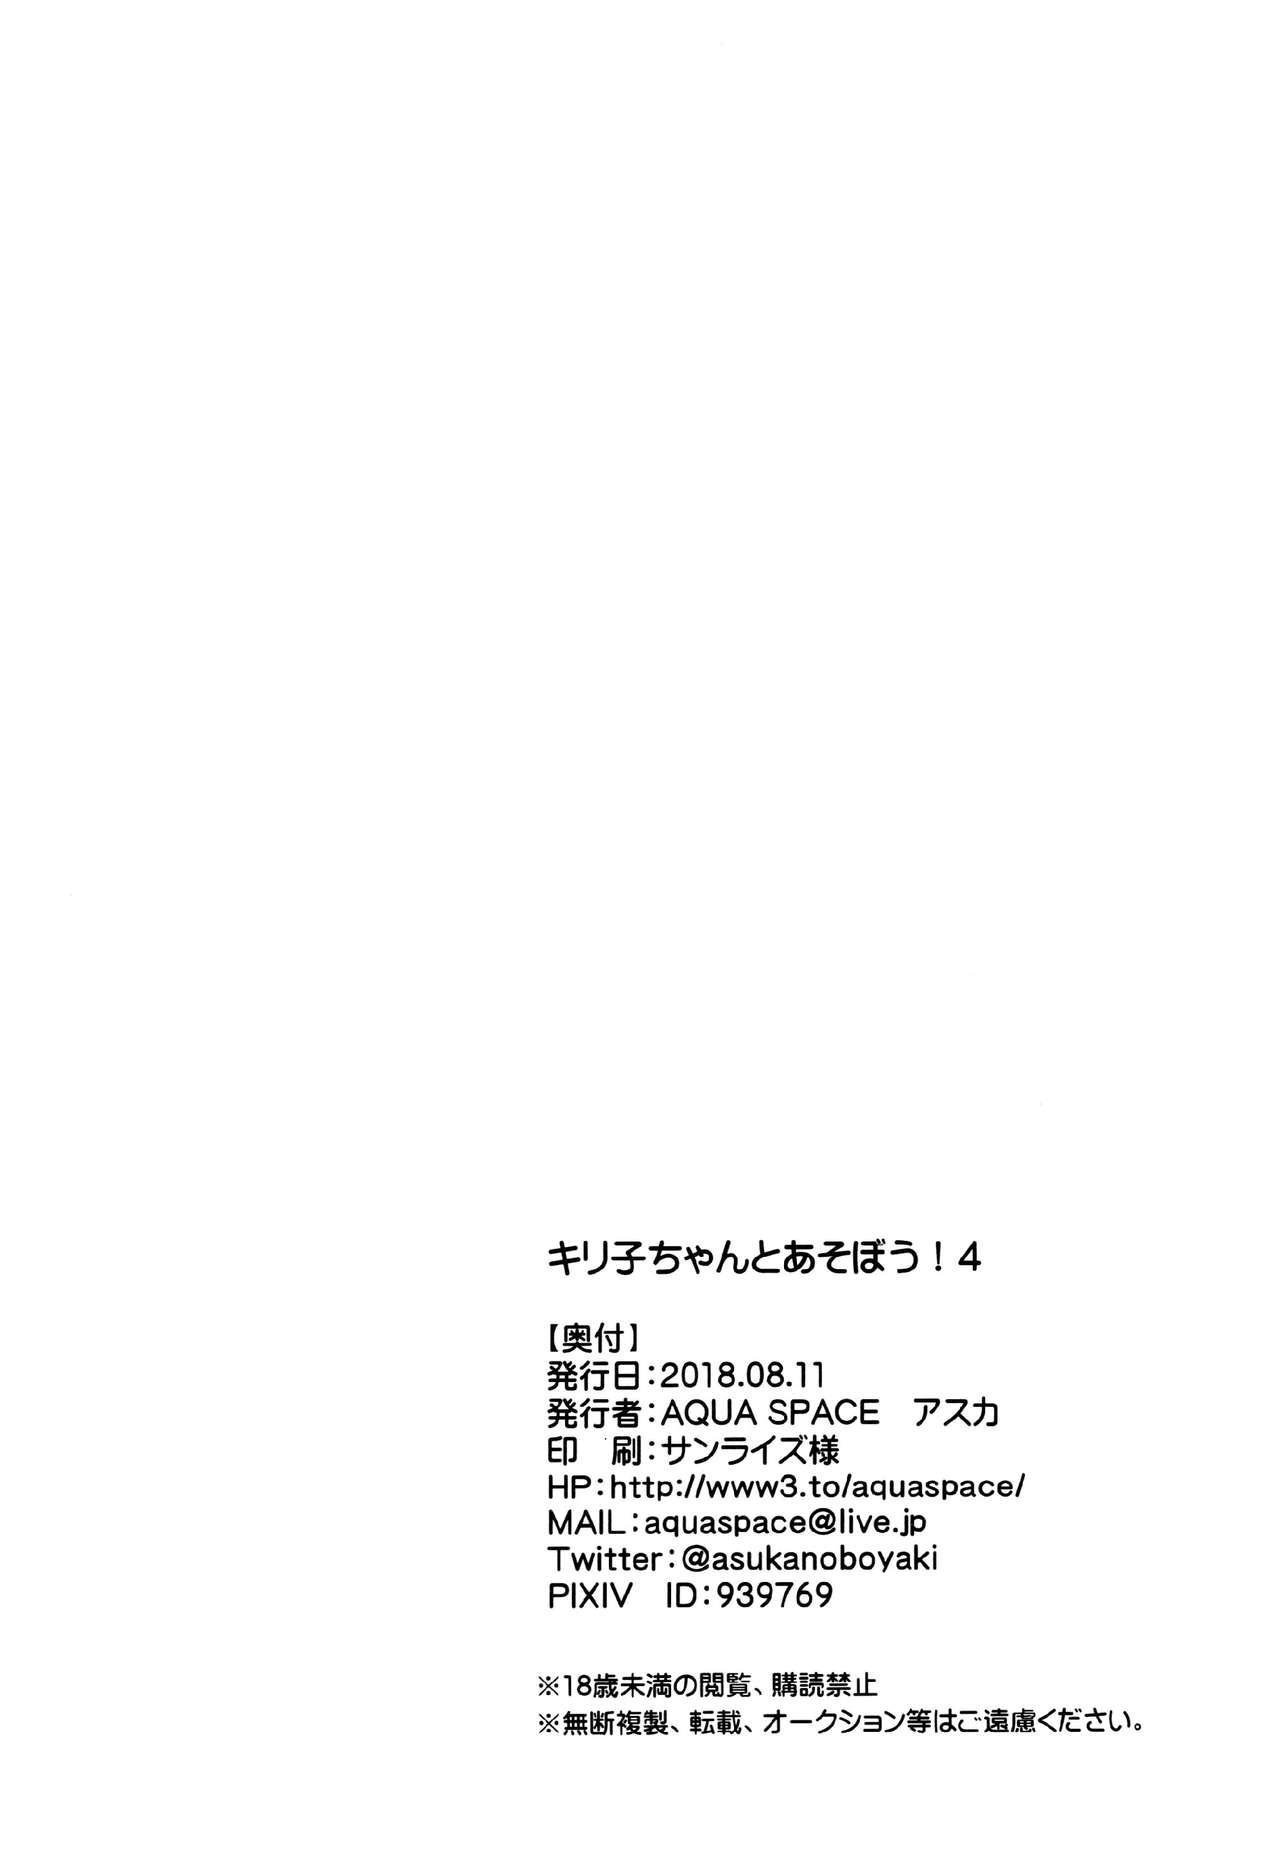 (C94) [AQUA SPACE (Asuka)] Kiriko-chan to Asobou! 4 | Let's play with Kiriko-chan! 4 (Sword Art Online) [English] [EHCOVE] 20